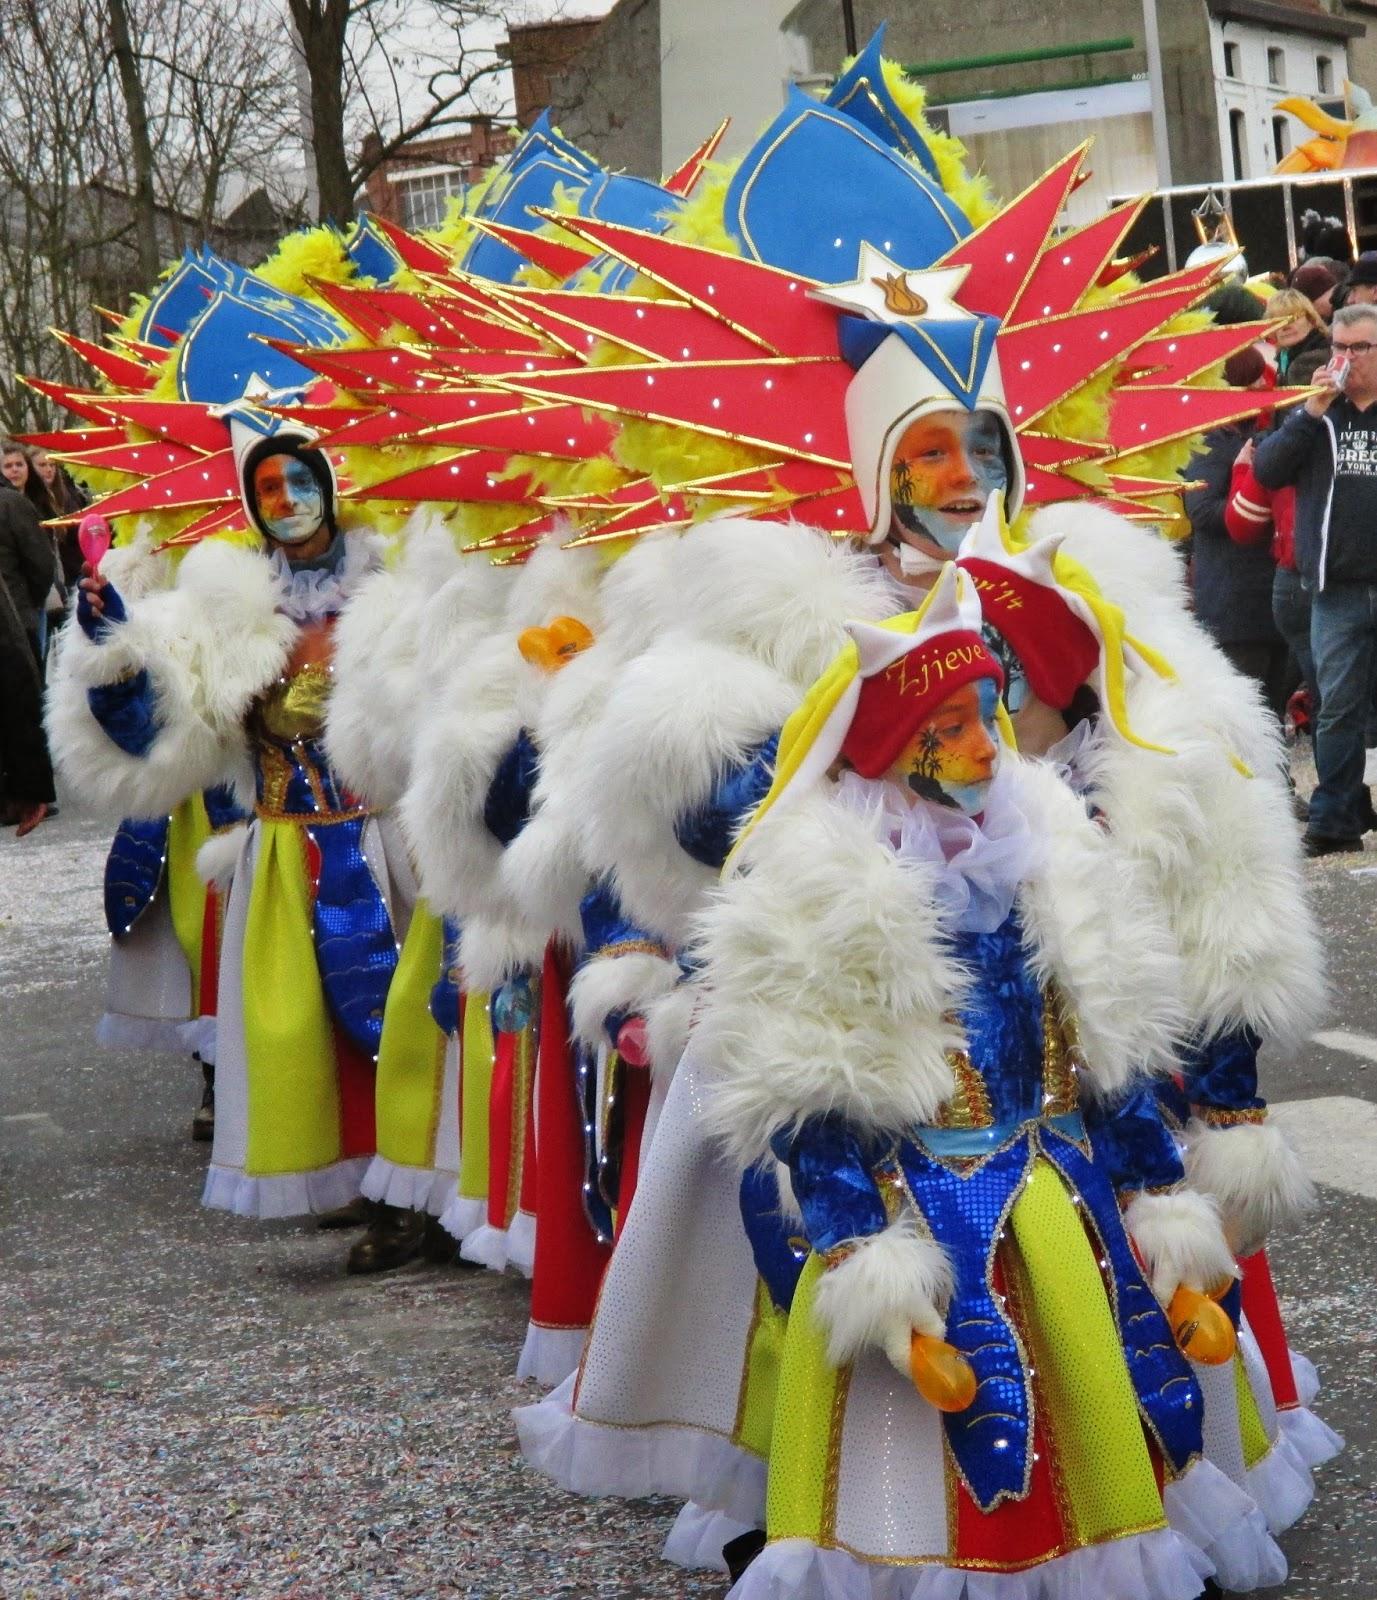 Carnaval Aalst foto- en videoblog: *SOAP* Terugblik